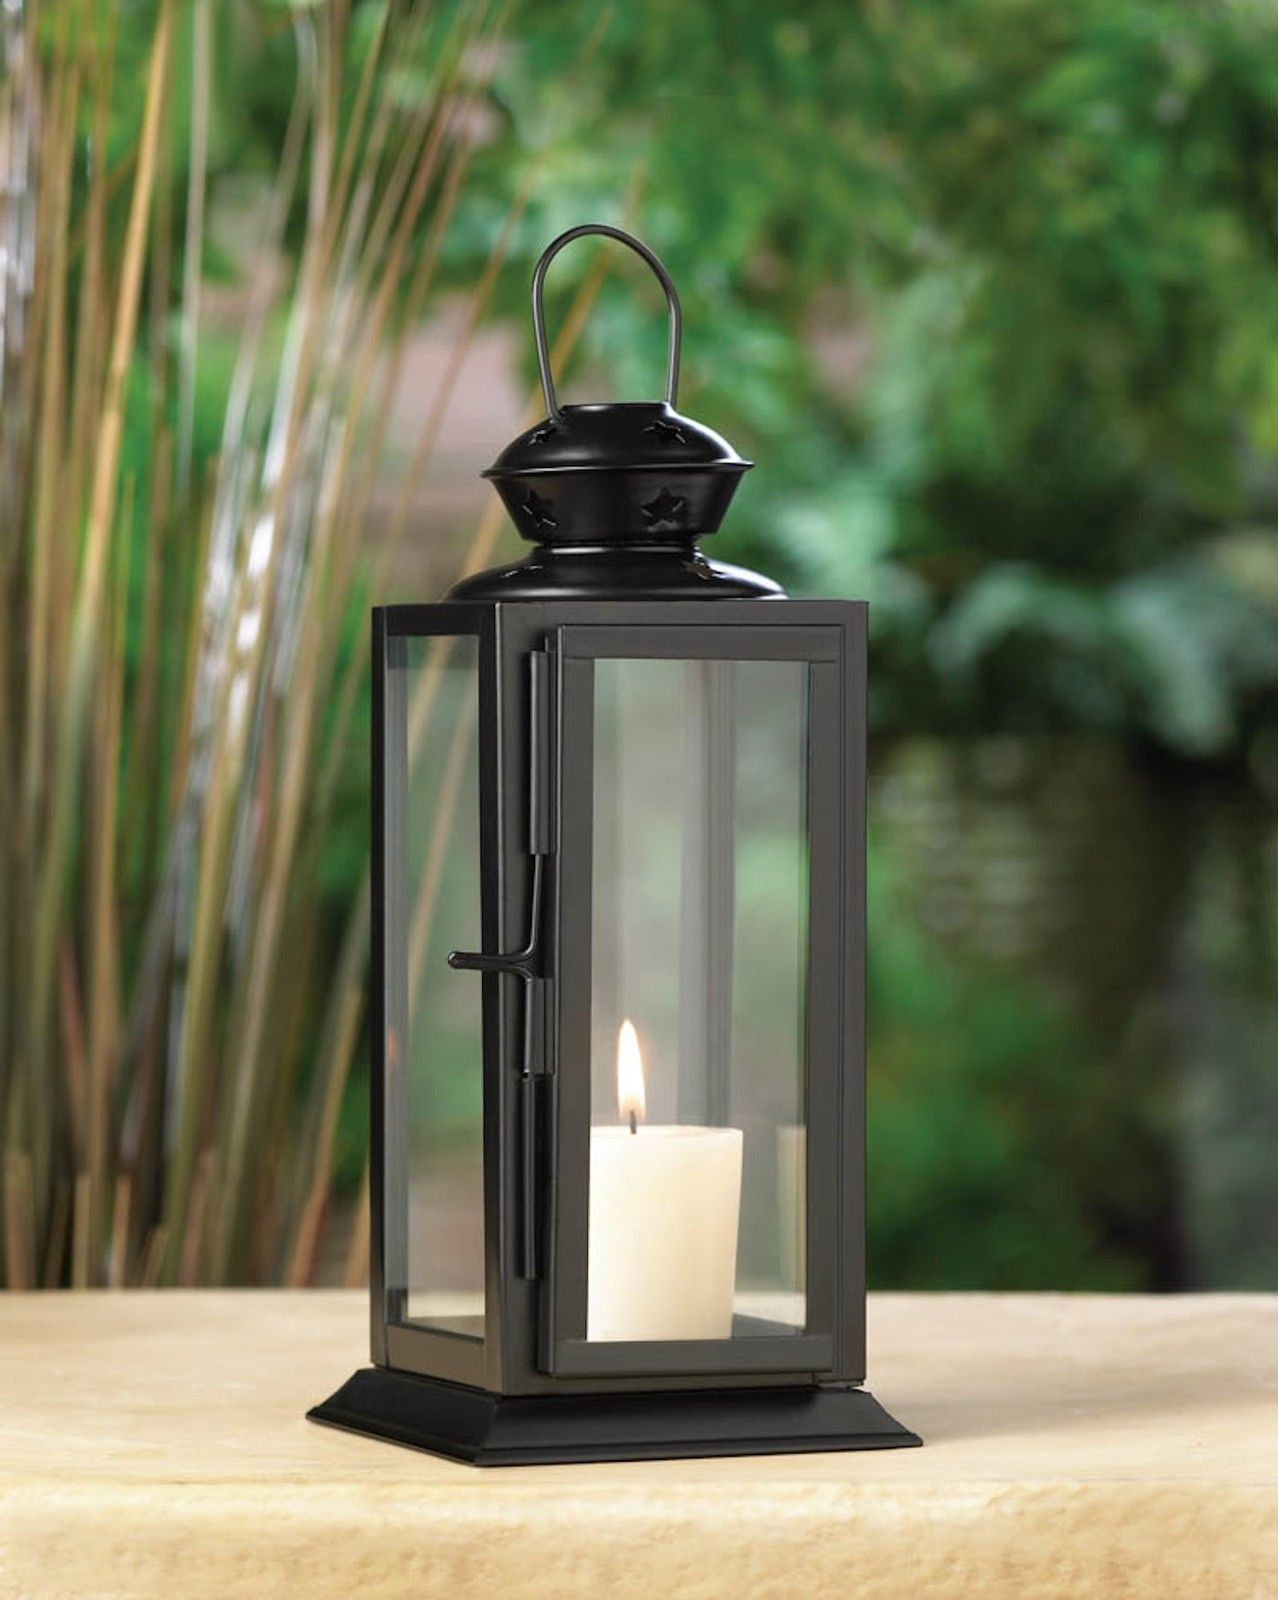 30 BLACK Lantern Candle Holder WEDDING Centerpieces